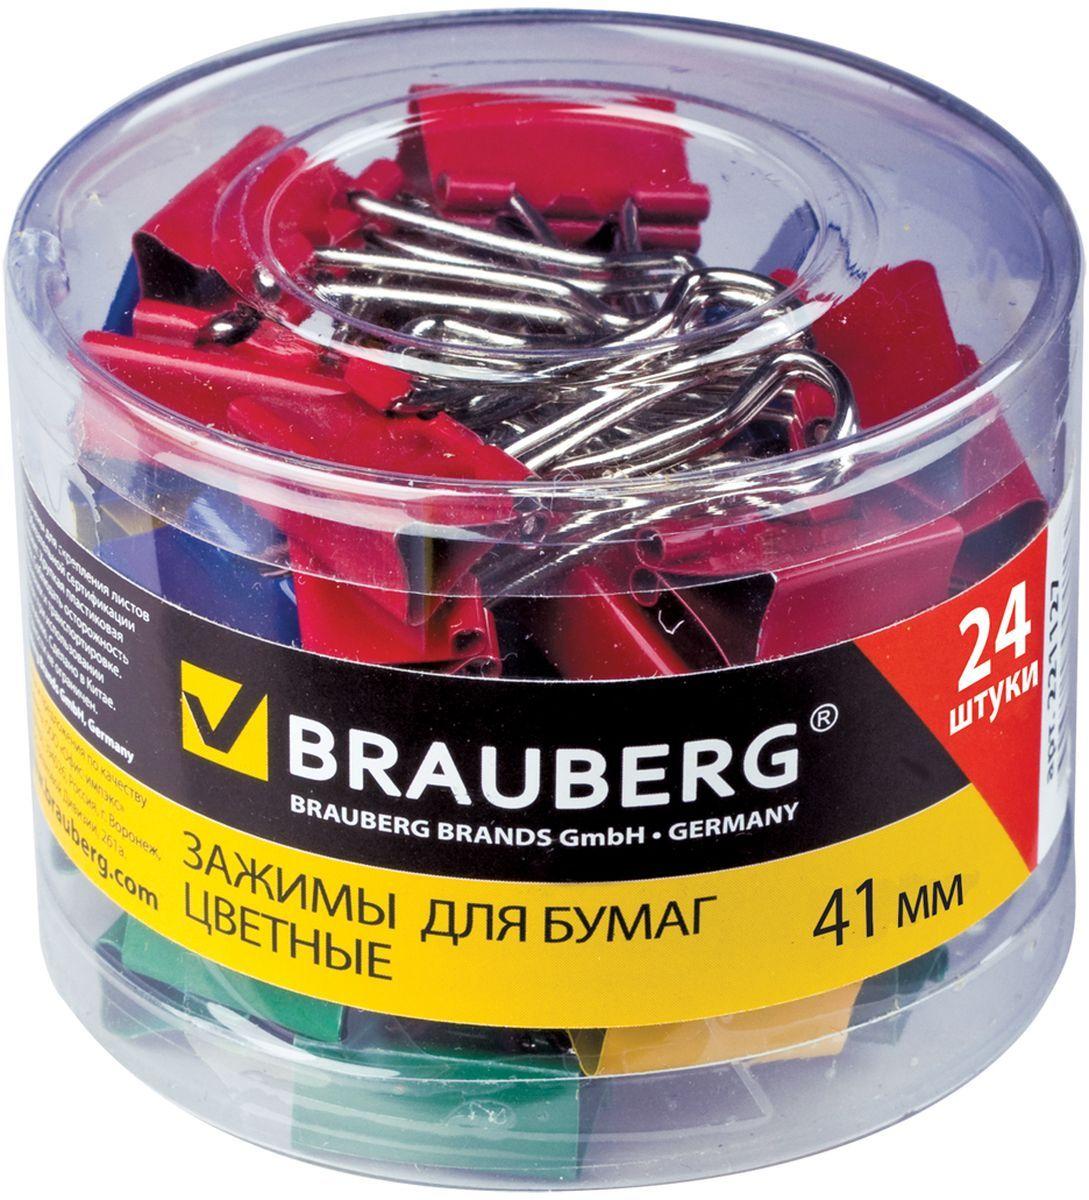 Brauberg Зажим для бумаг 41 мм 24 шт -  Скрепки, кнопки, зажимы